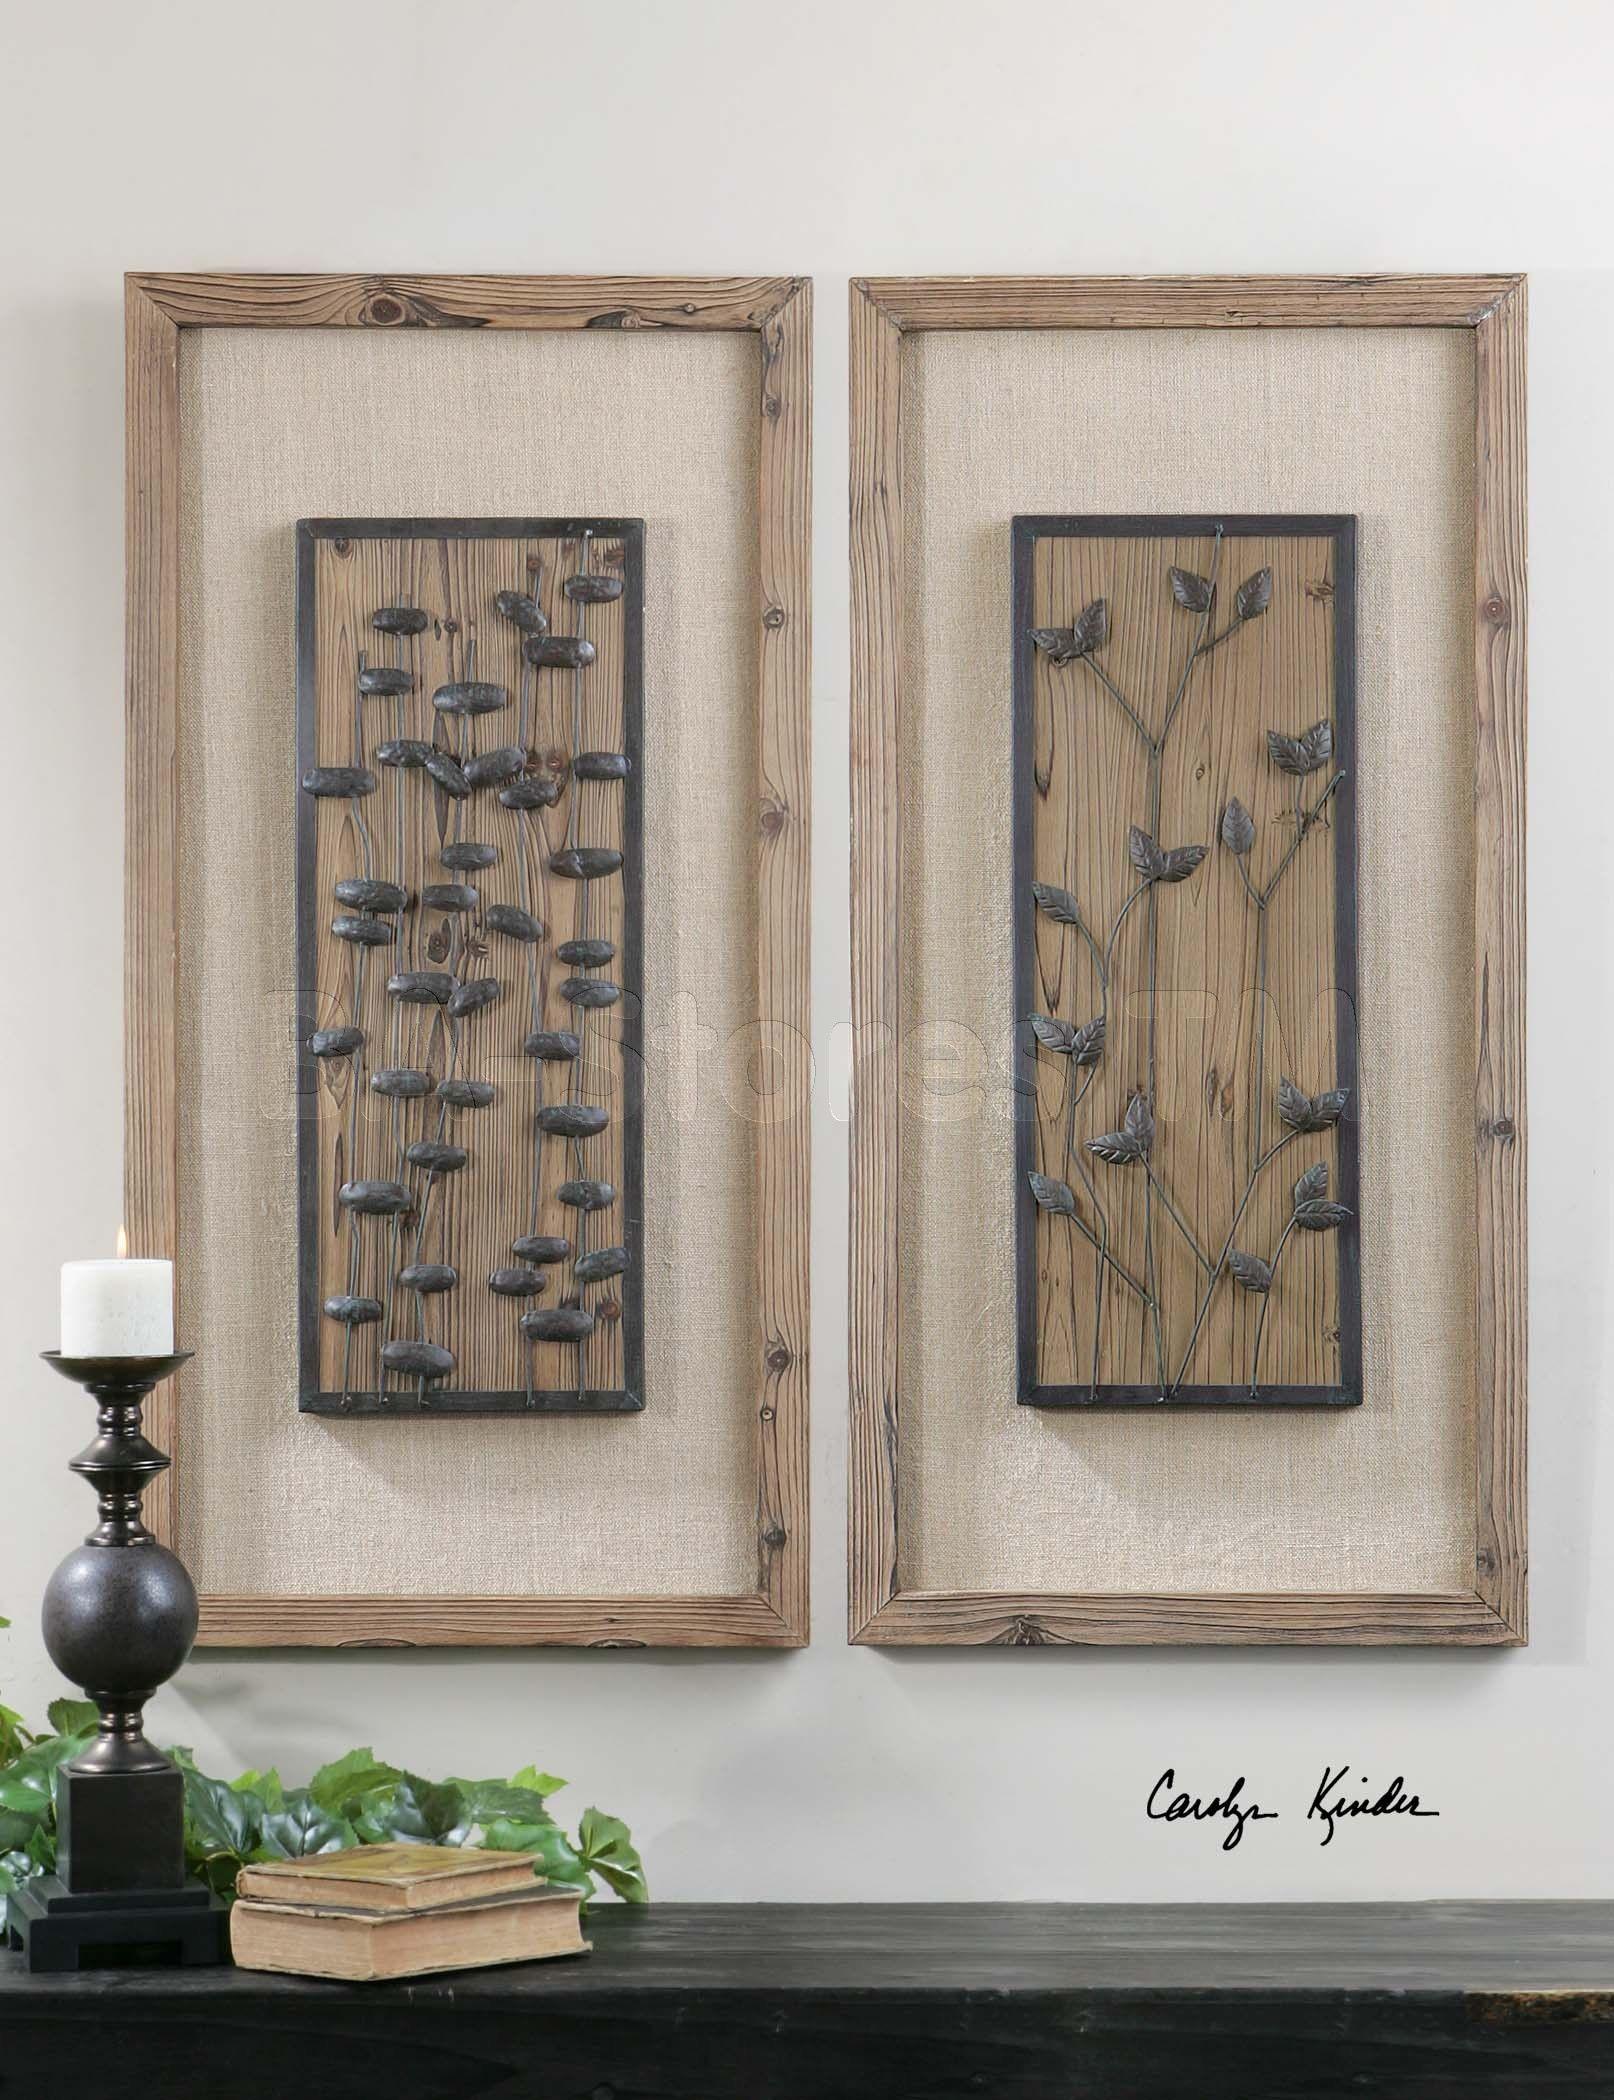 burlap wall art chinook burnished wood with burlap matting wall